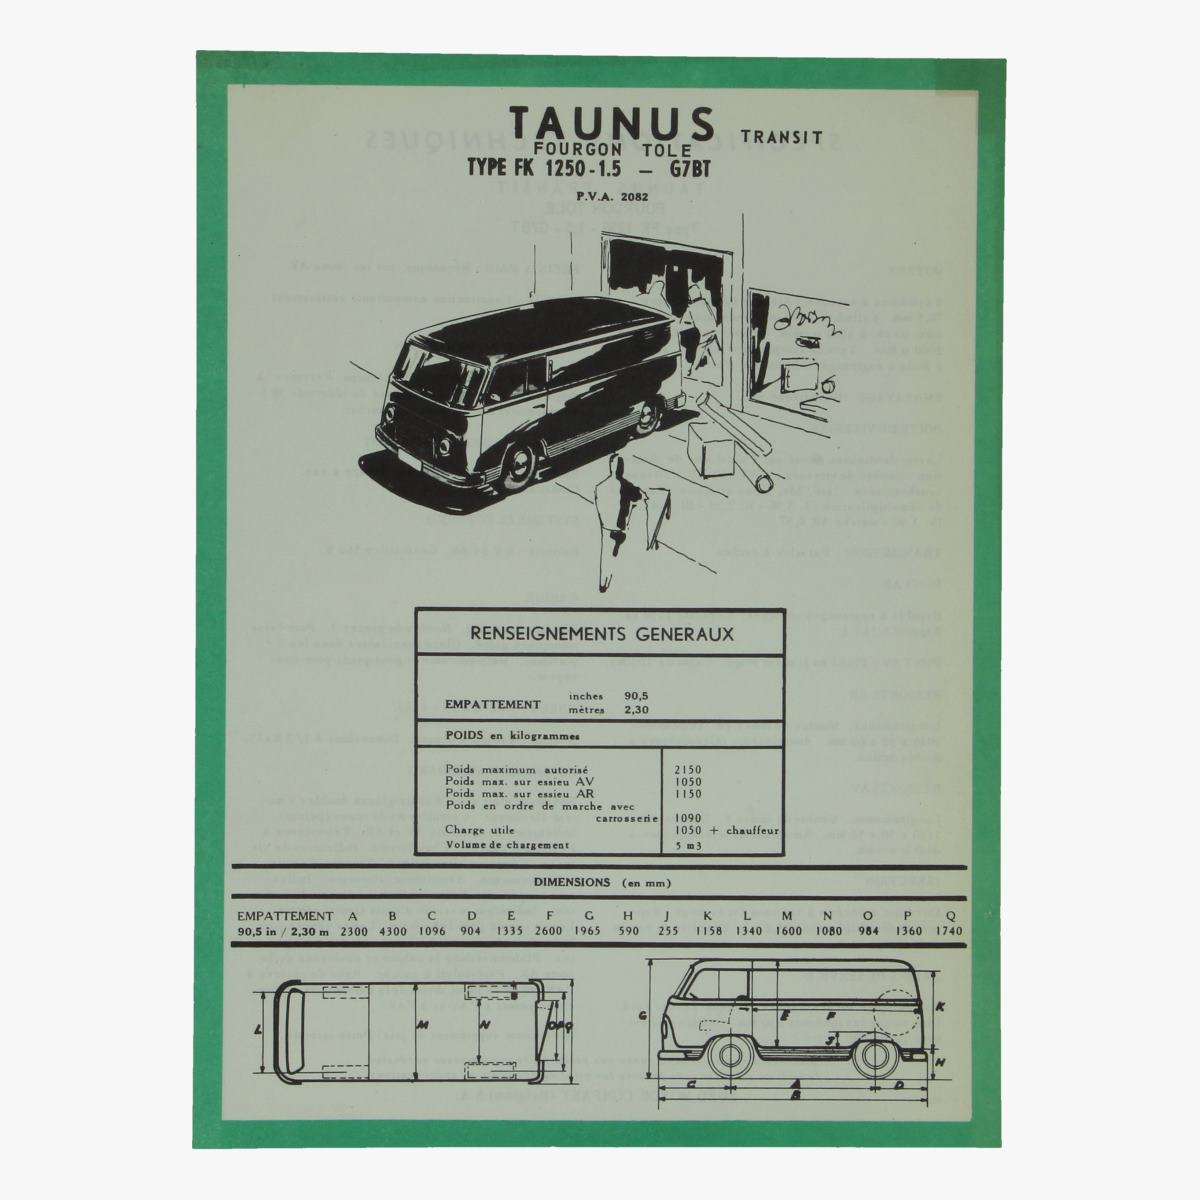 Afbeeldingen van specifications techniques taunus transit fourgon tole ford motor comp.